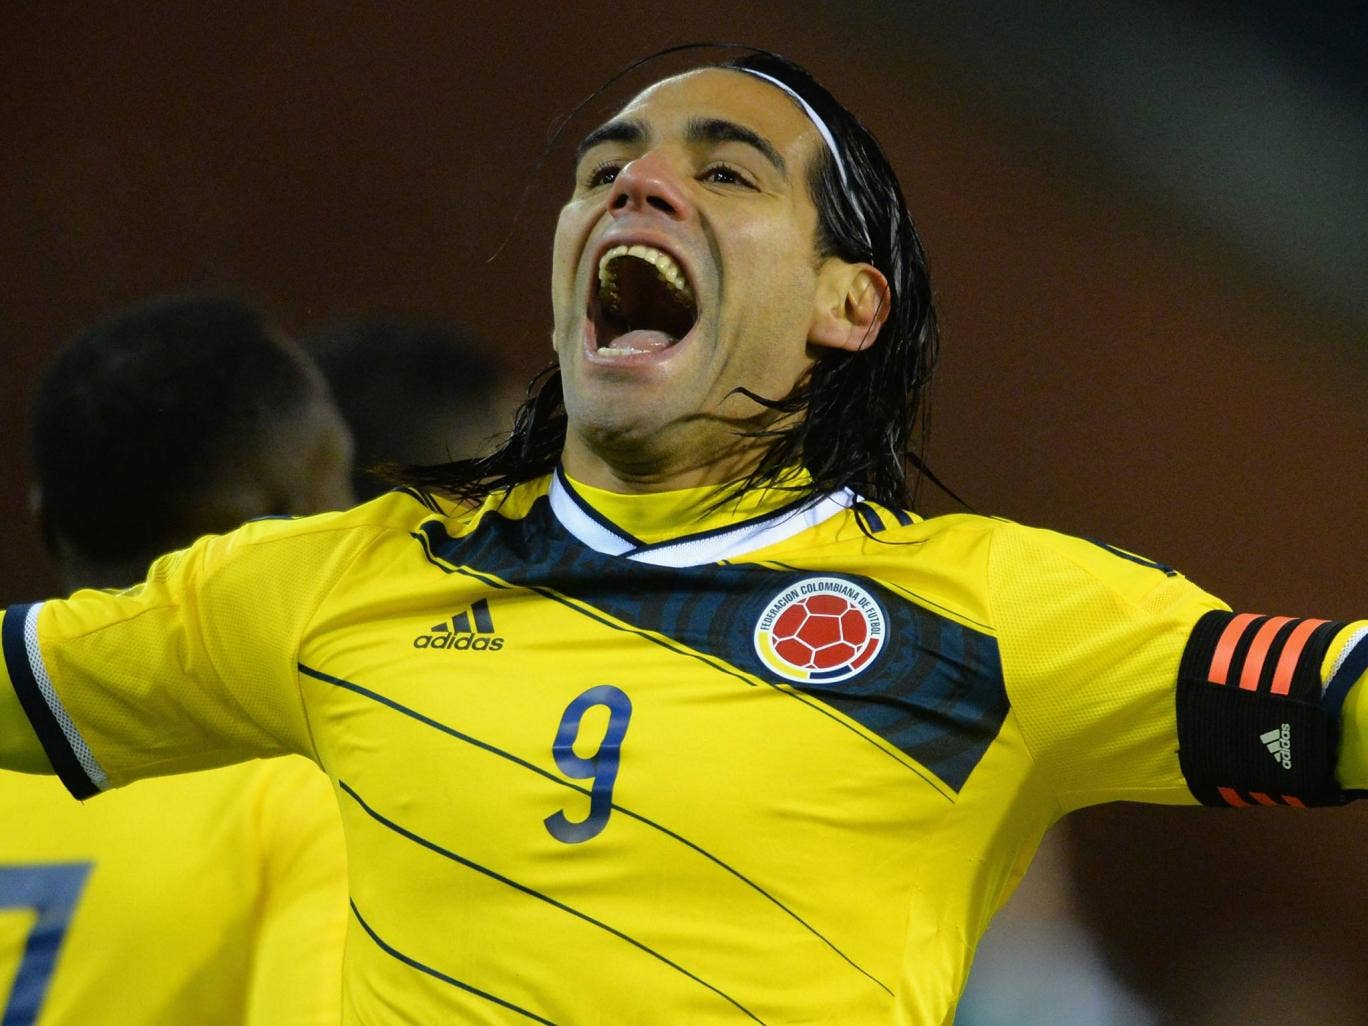 Radamel Falcao celebrates a goal for Colombia against Belgium